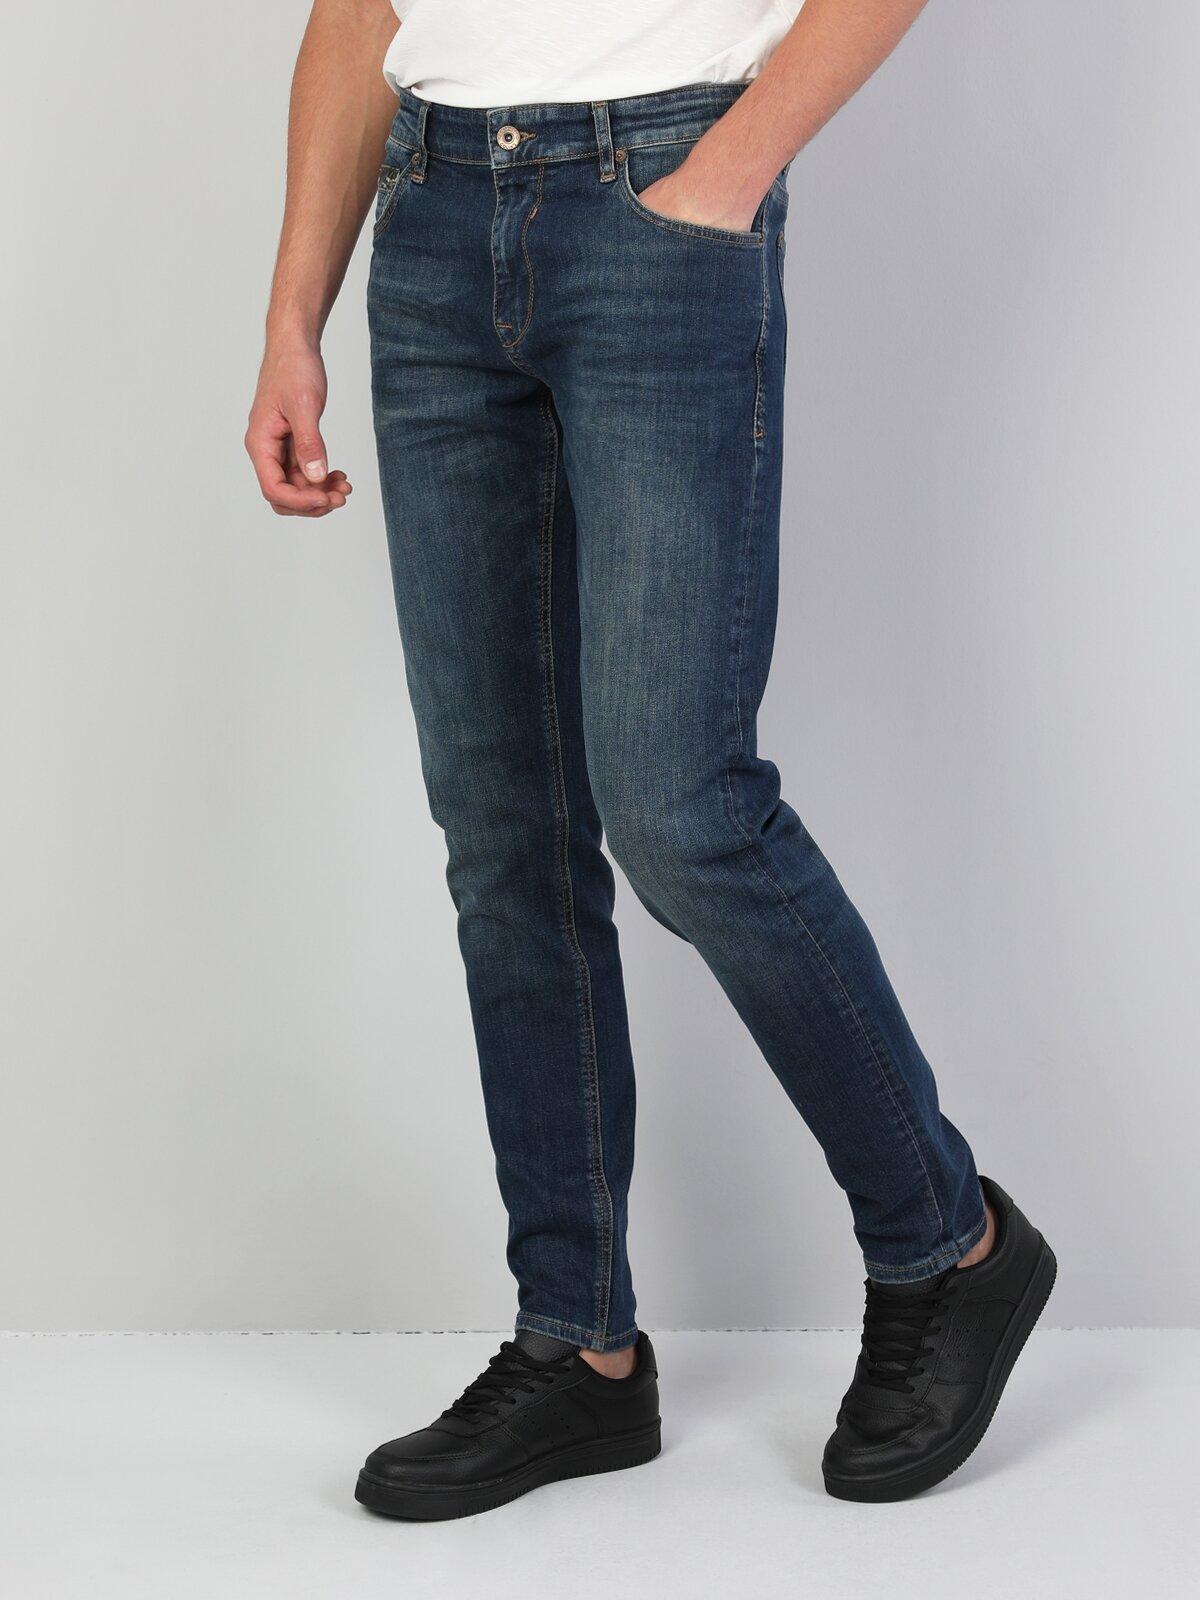 041 Danny Dar Kesim Mavi Erkek Denim Pantolon